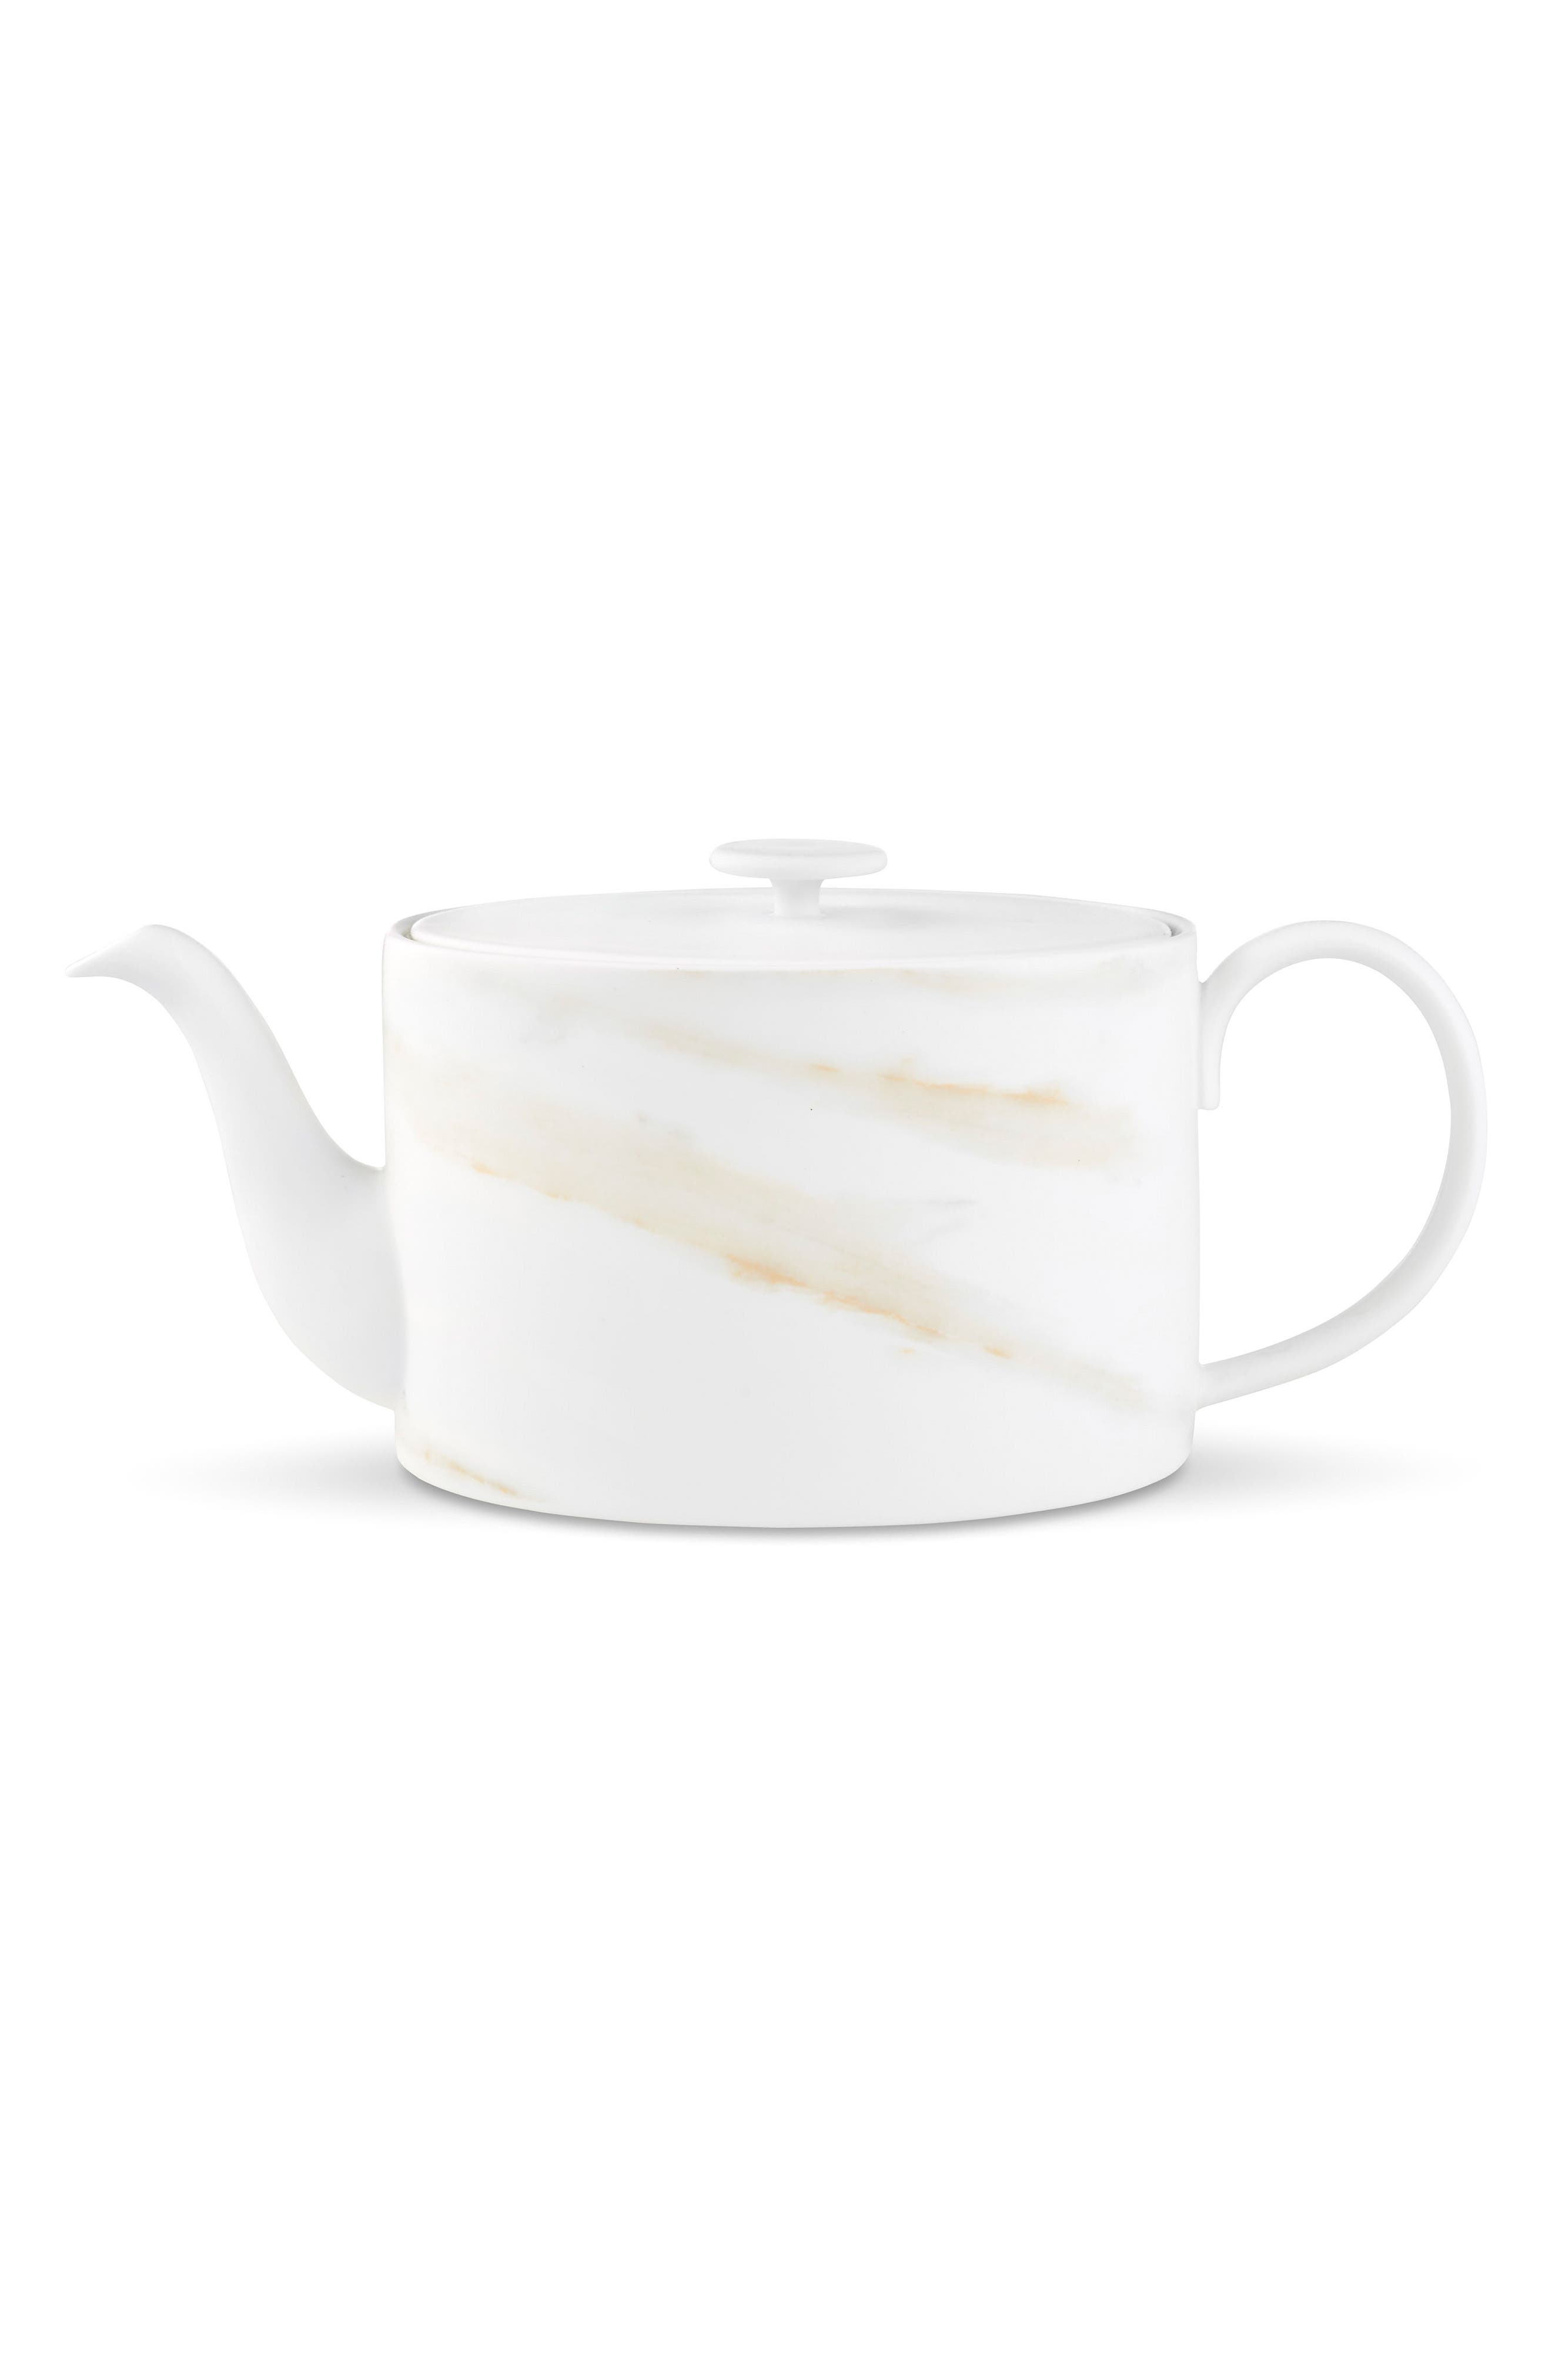 Alternate Image 1 Selected - Vera Wang x Wedgwood Venato Imperial Teapot